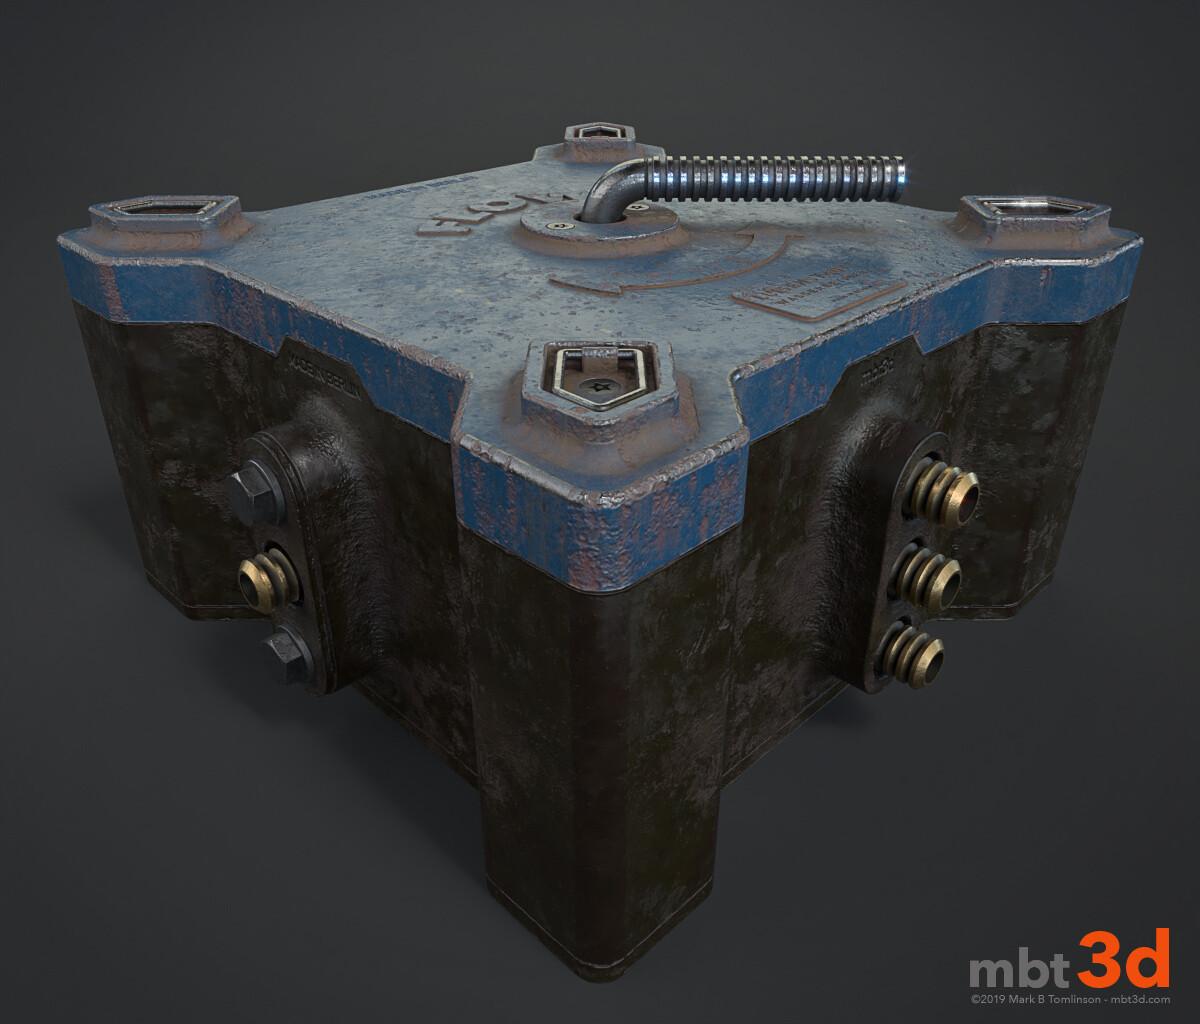 Mark b tomlinson flow box 03